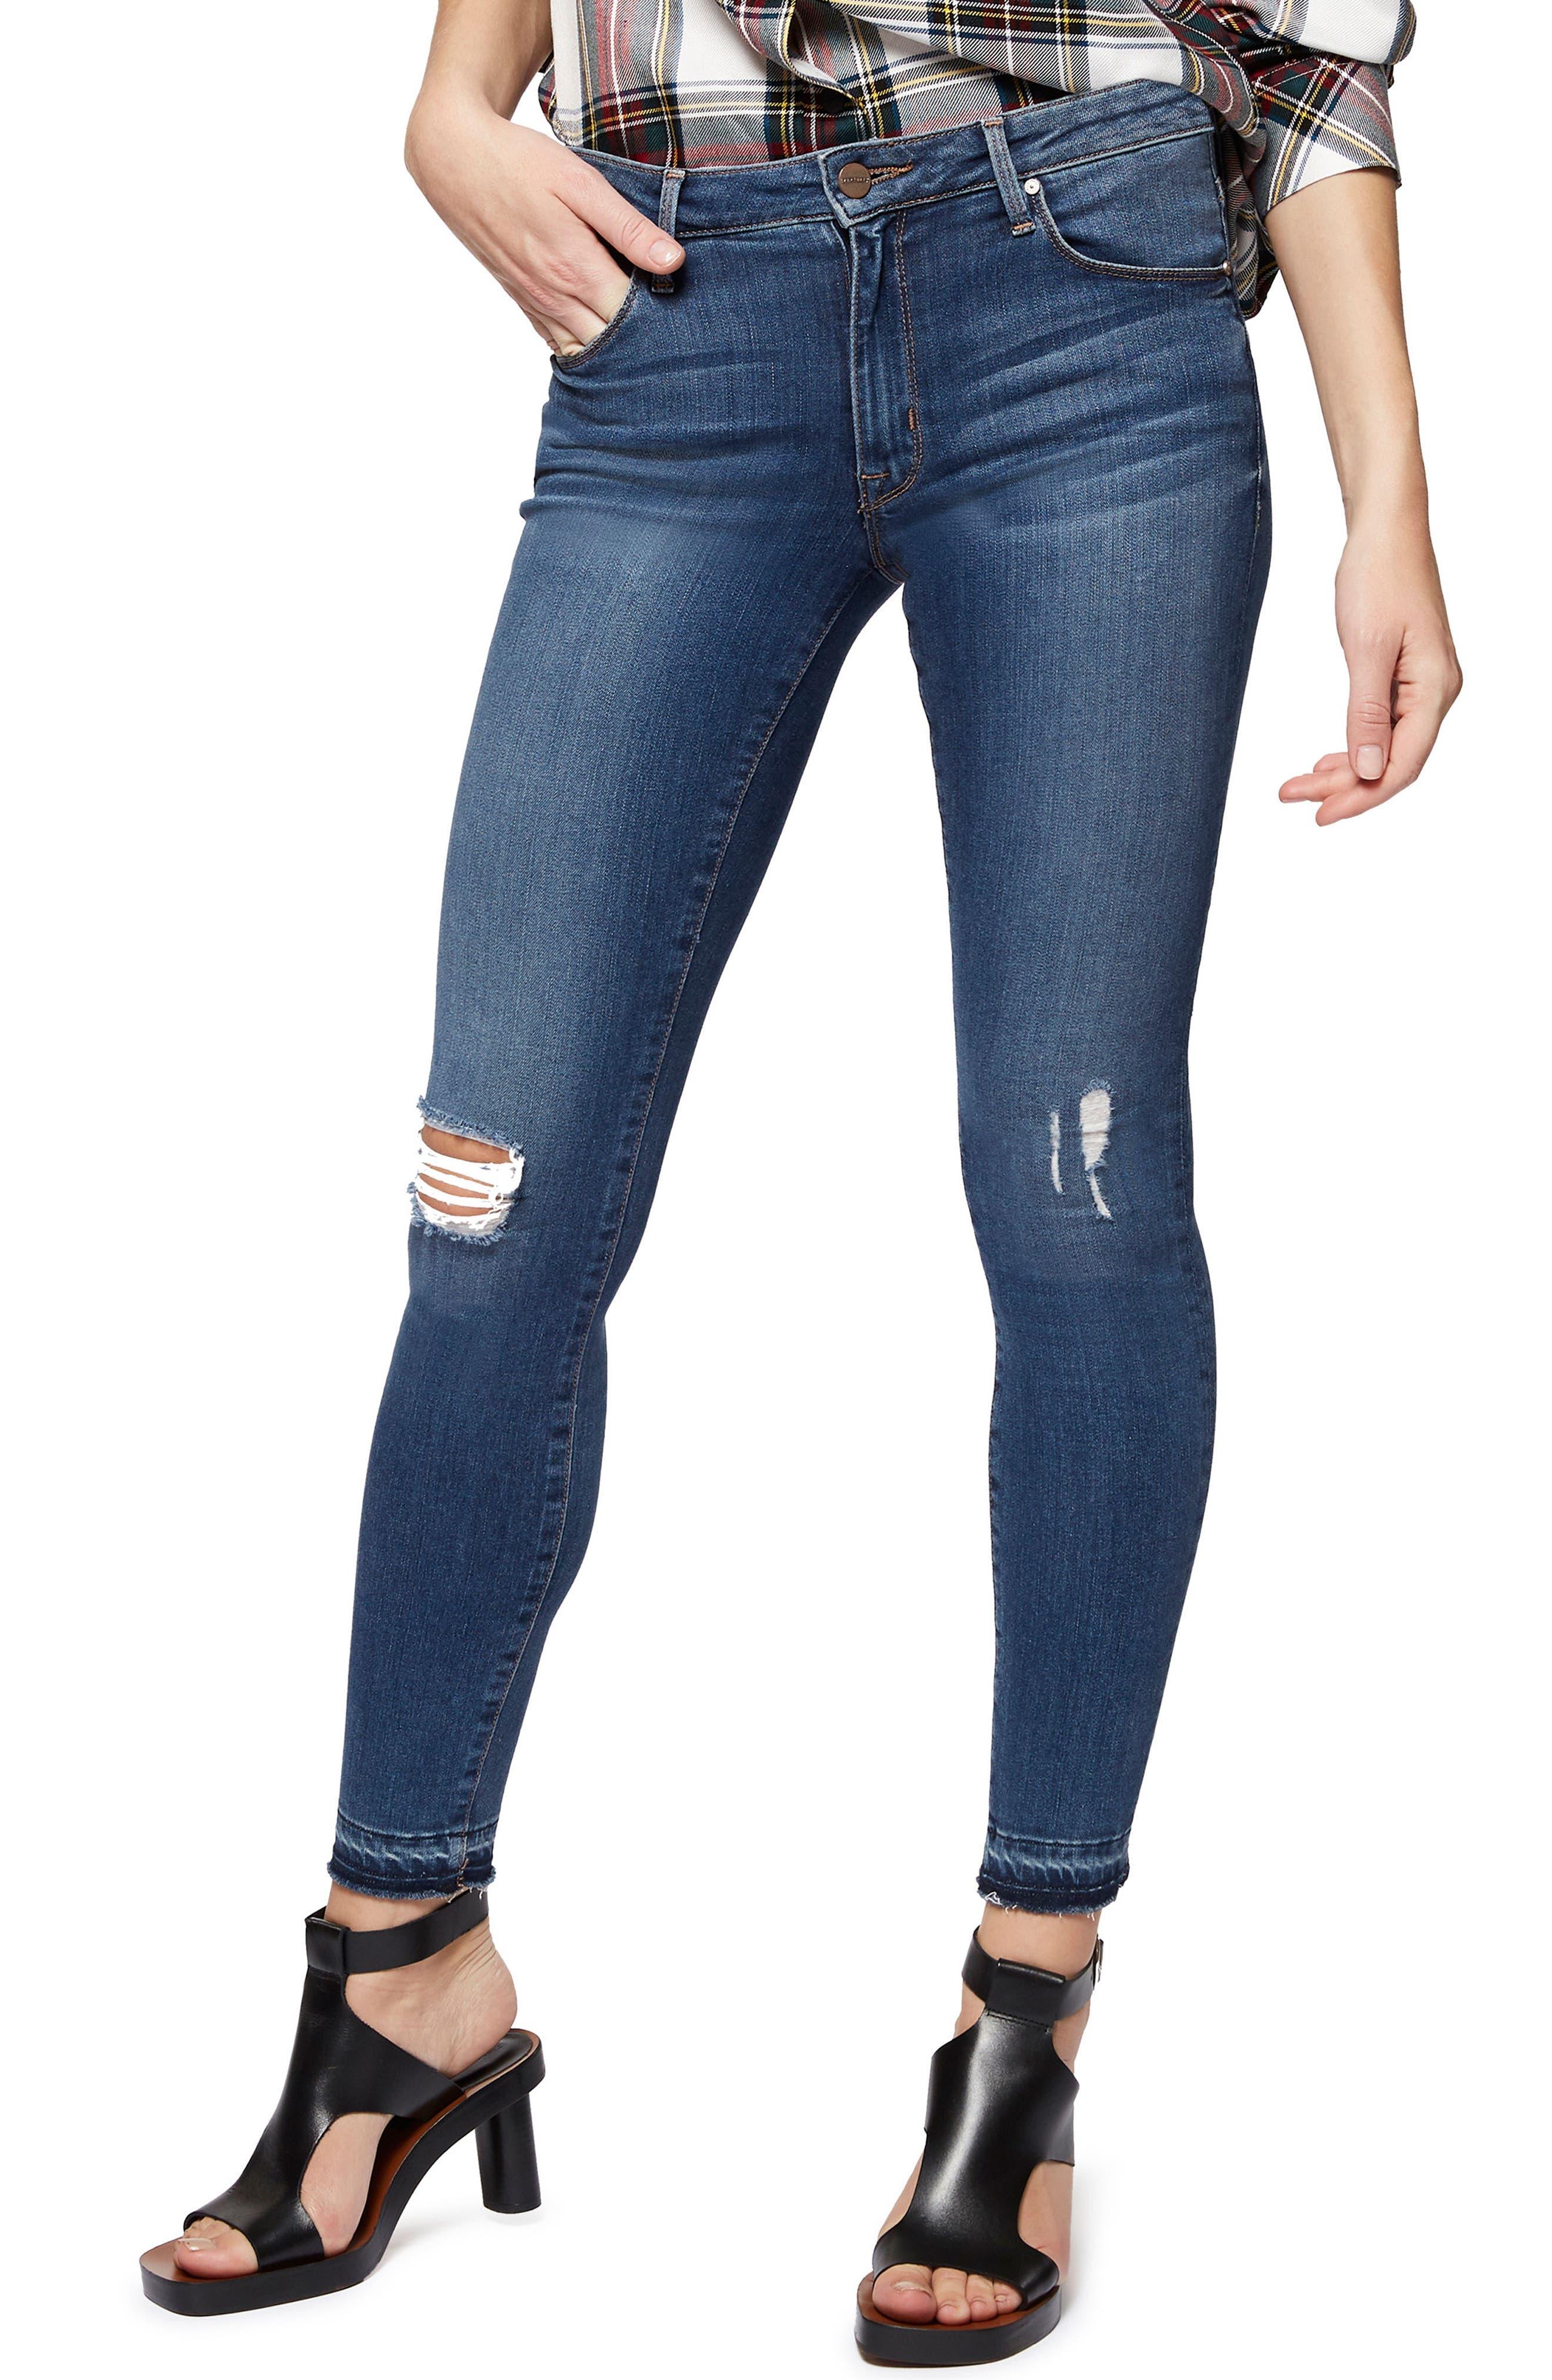 Robbie High Waist Skinny Jeans,                             Main thumbnail 1, color,                             421